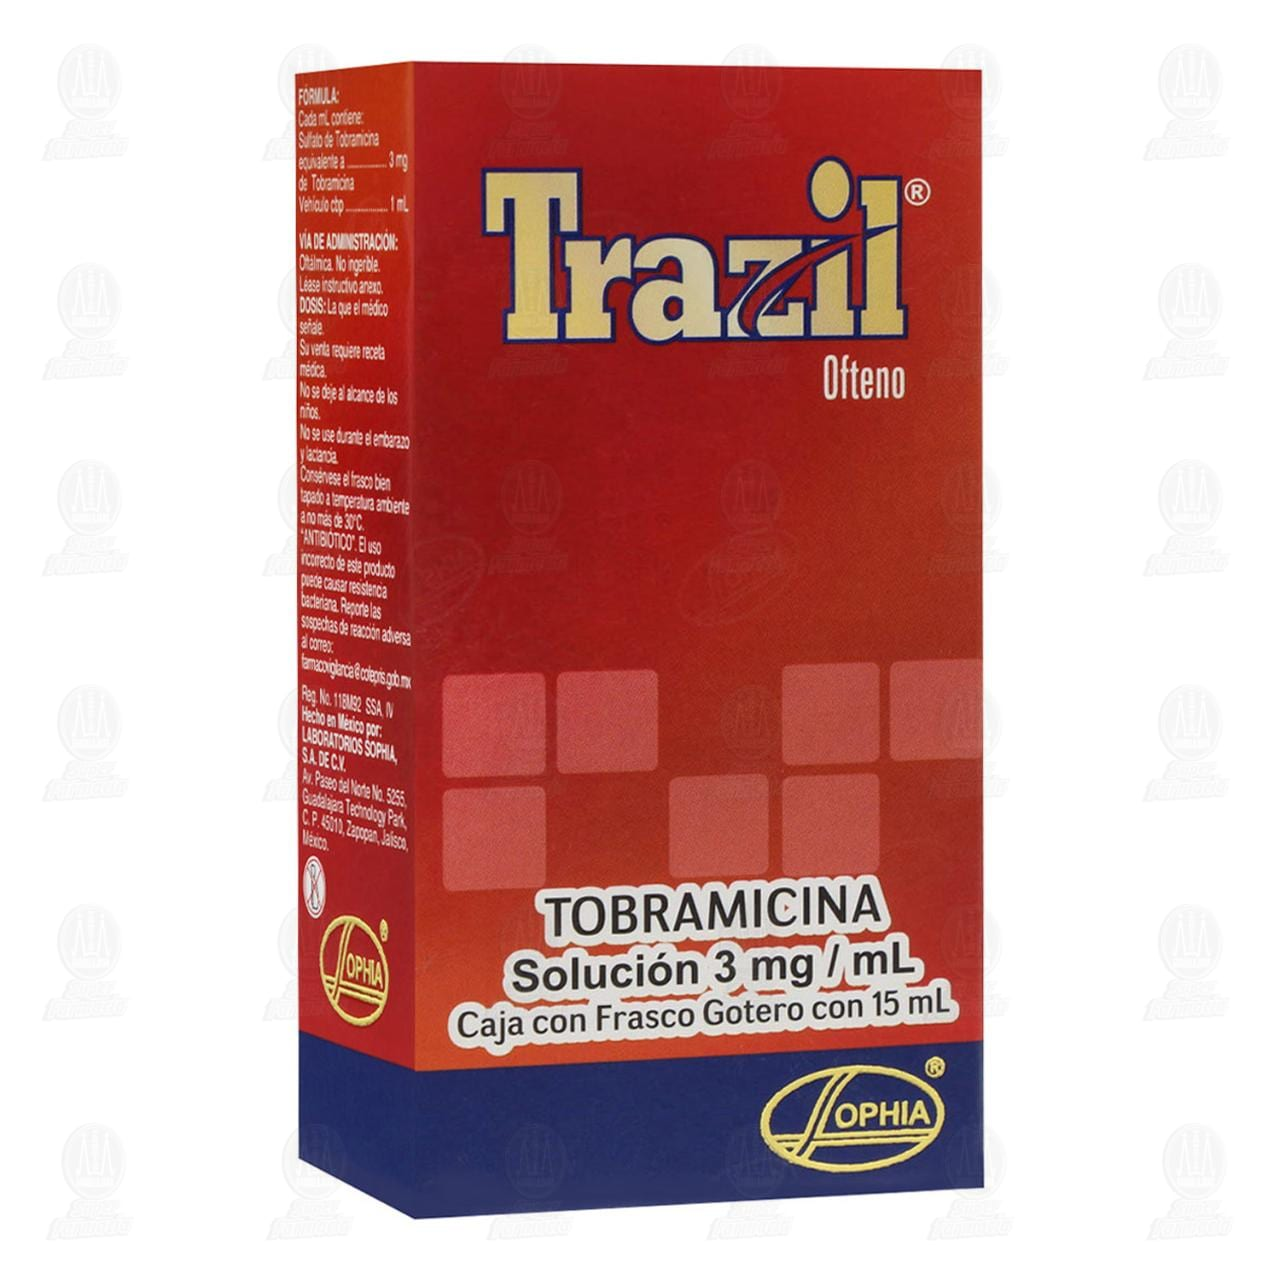 Comprar Trazil Ofteno 3mg/ml 15ml Solución Gotas en Farmacias Guadalajara